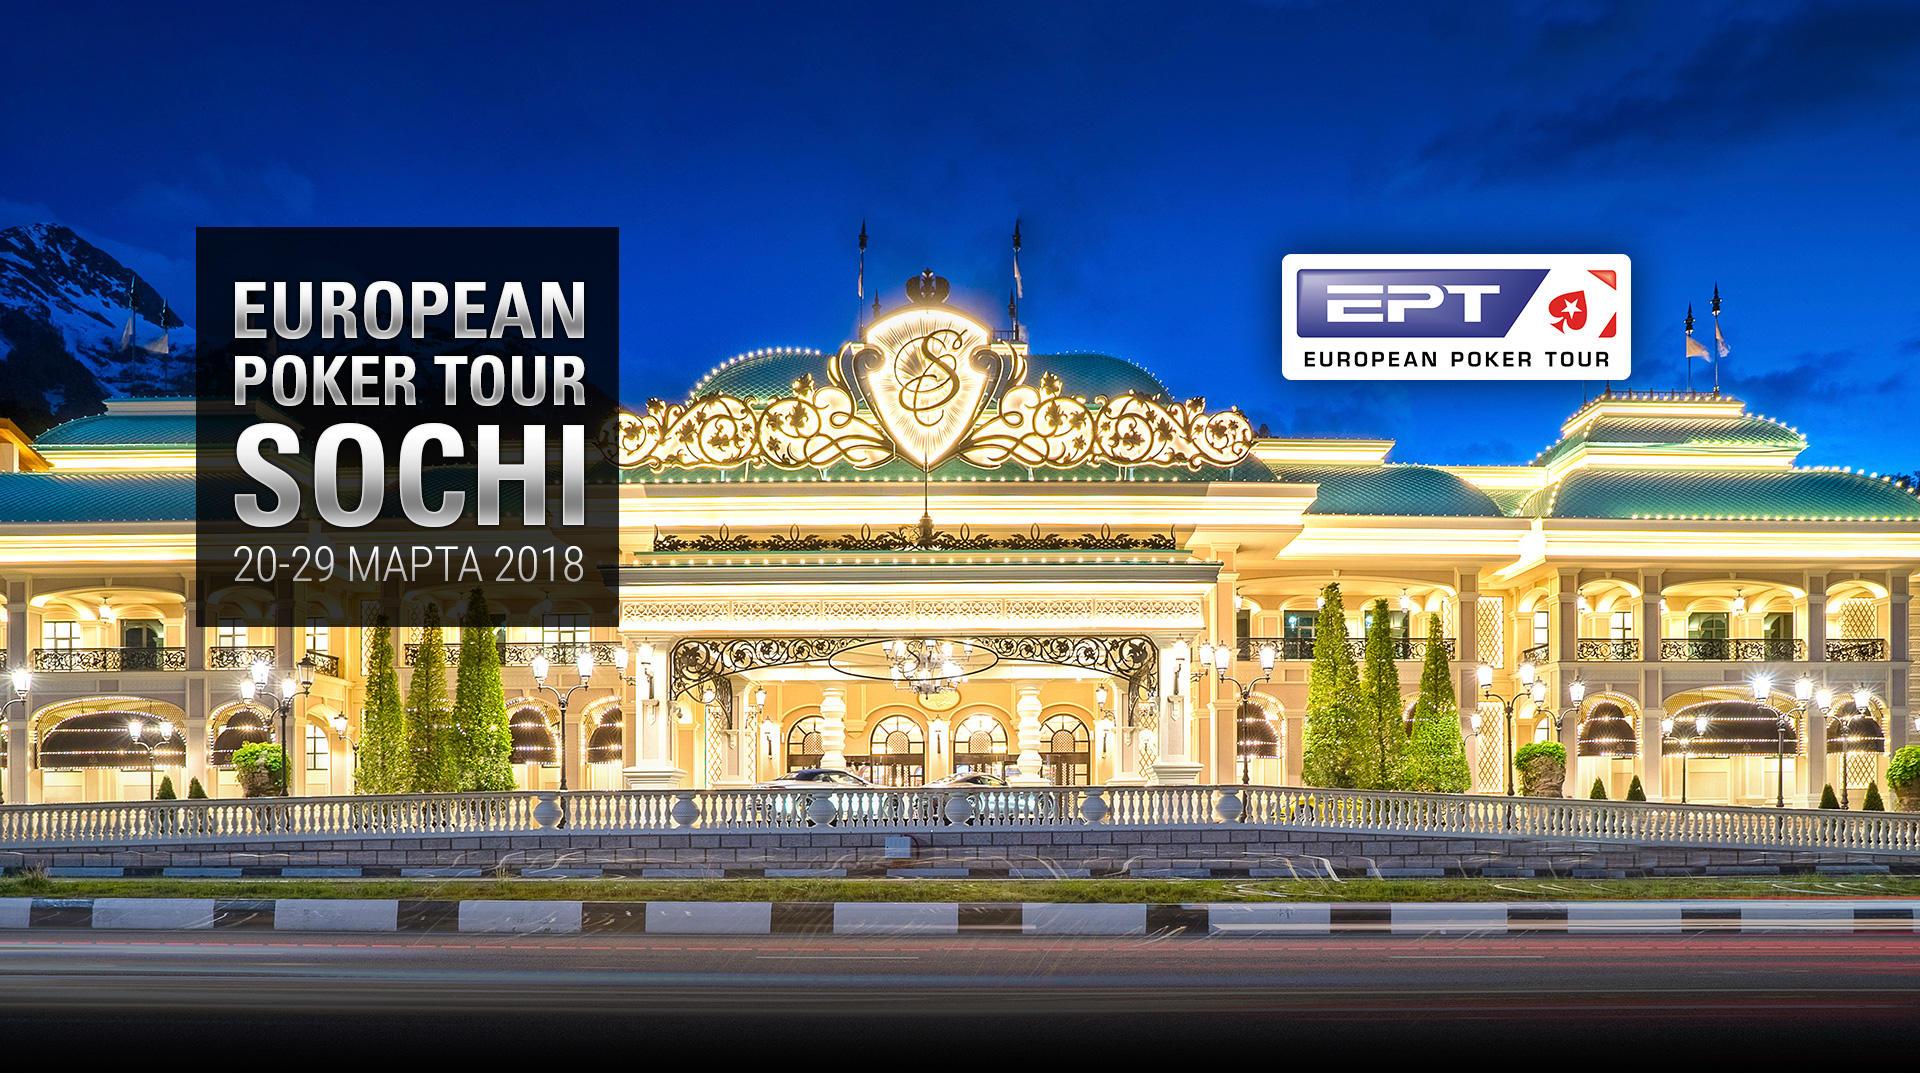 European poker tour sochi ps4 disc slot problems